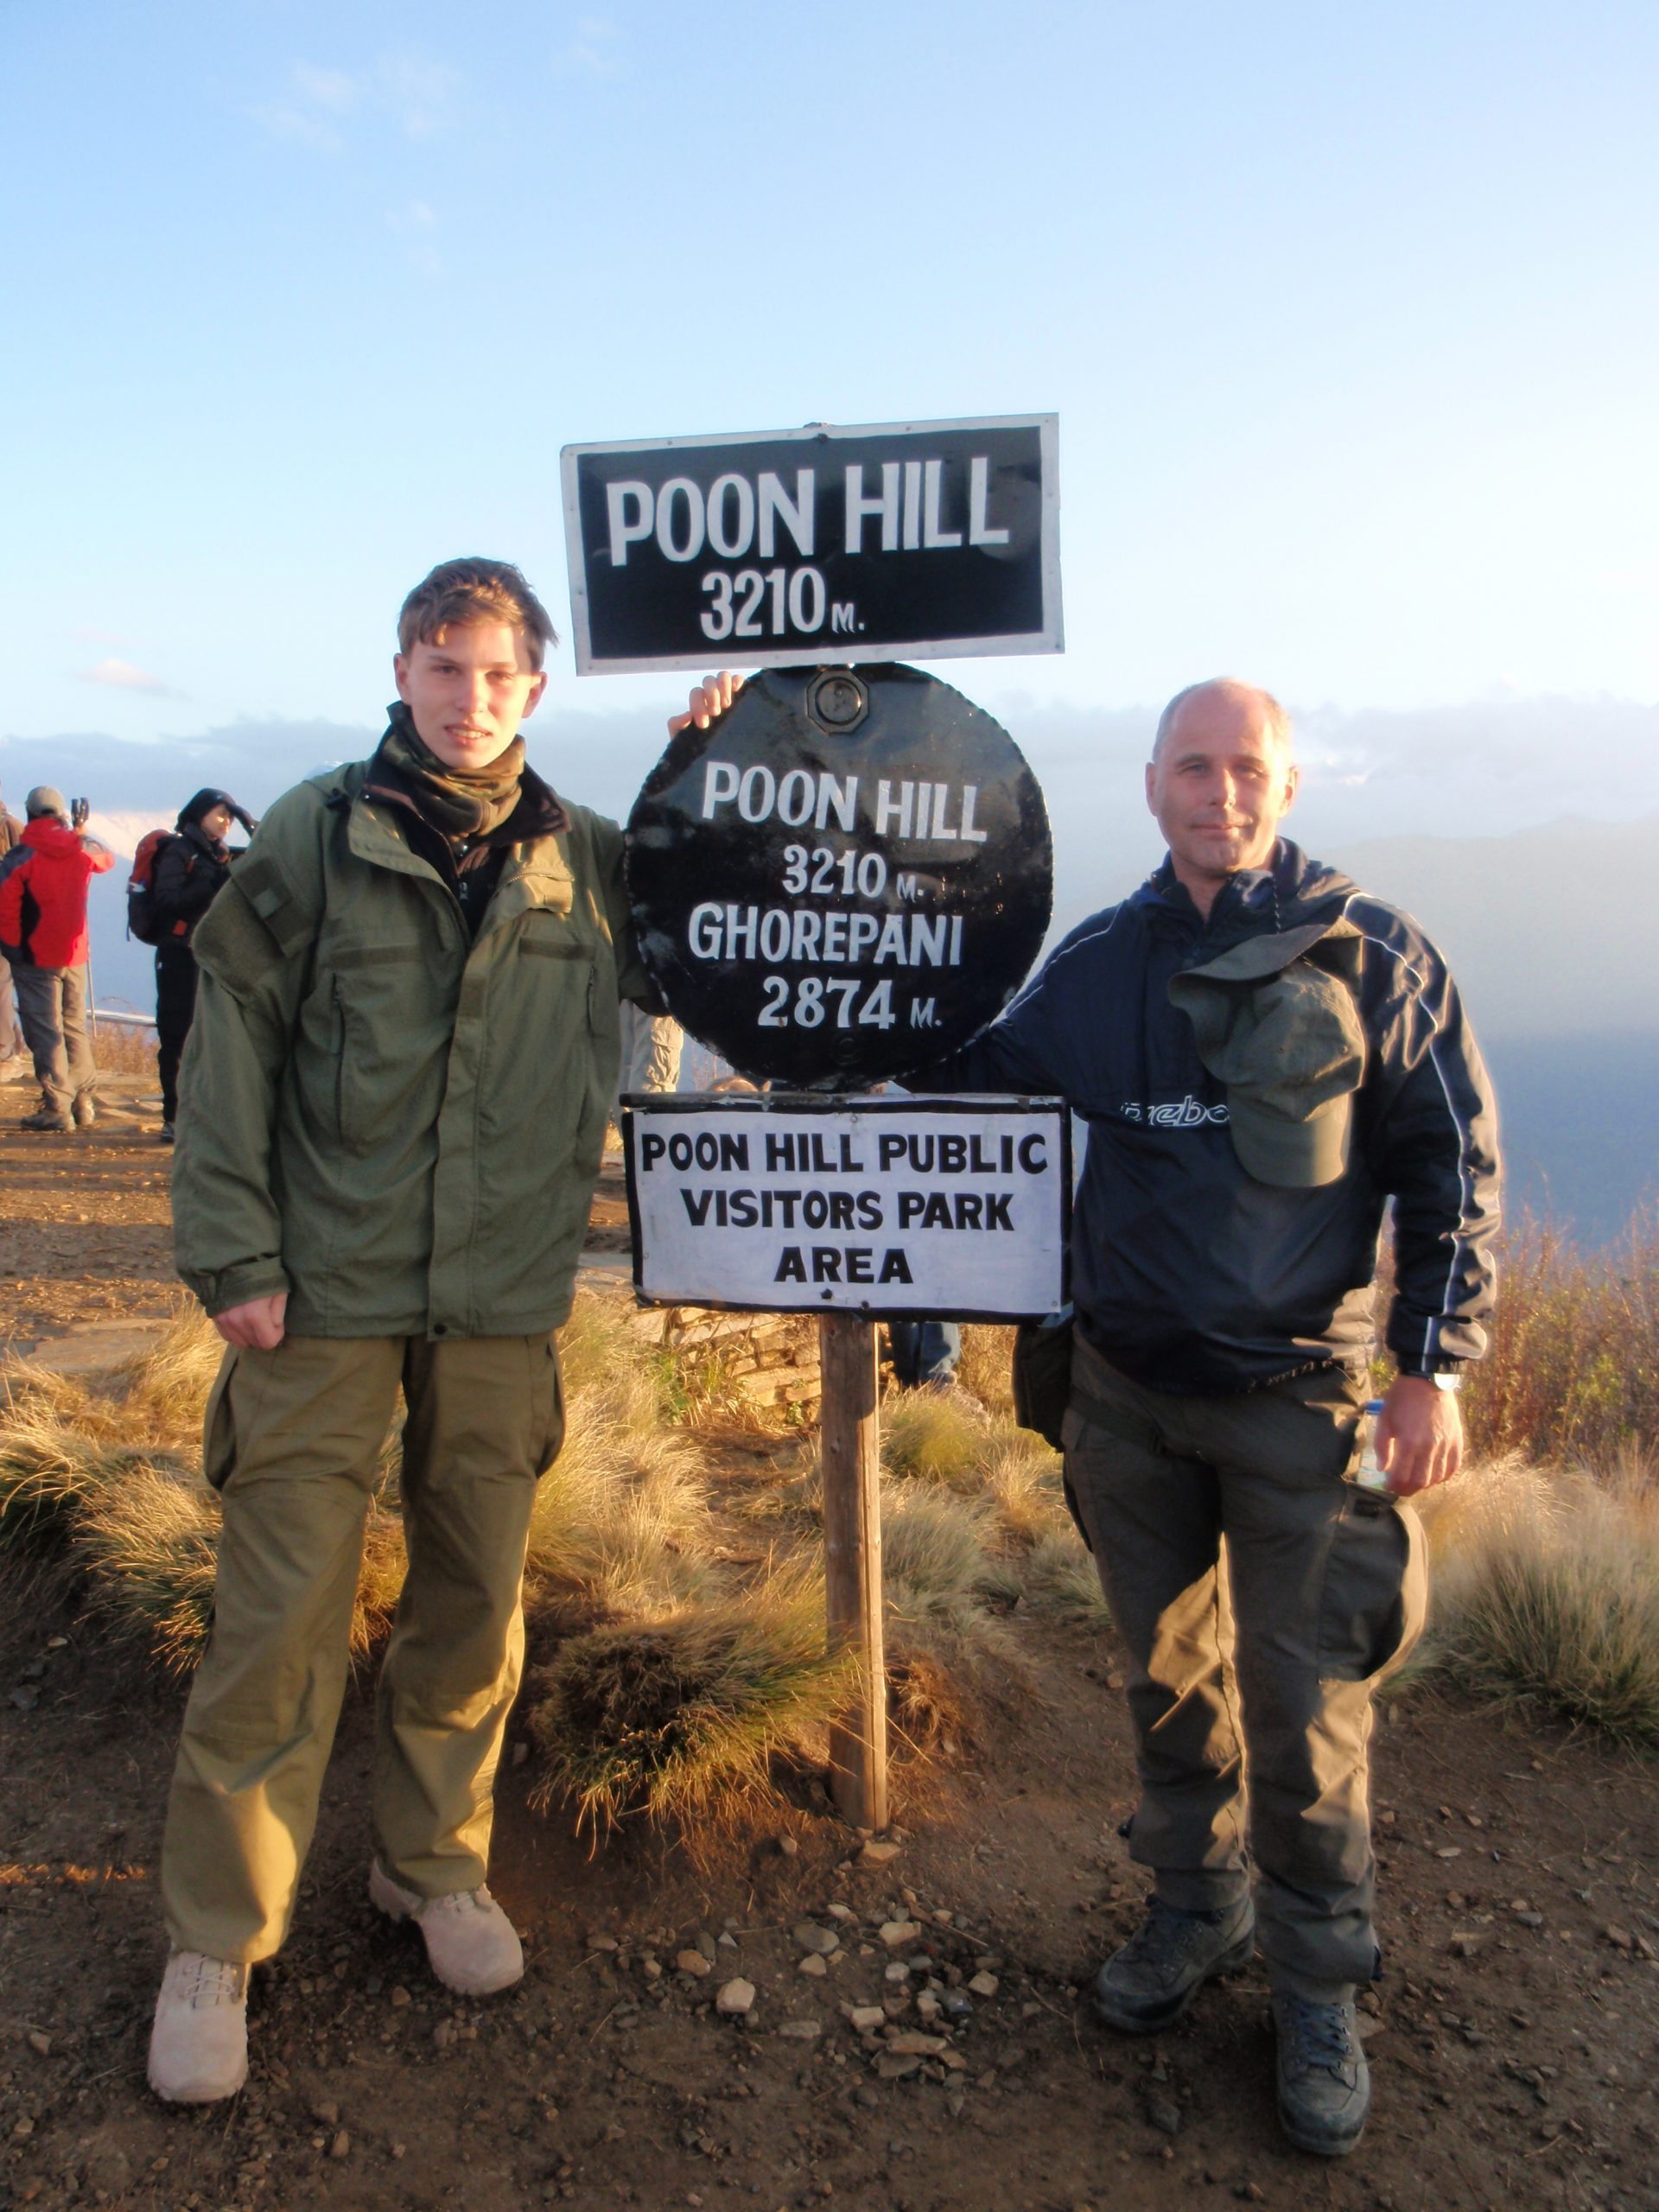 Poon Hill bei Ghorepani 2011